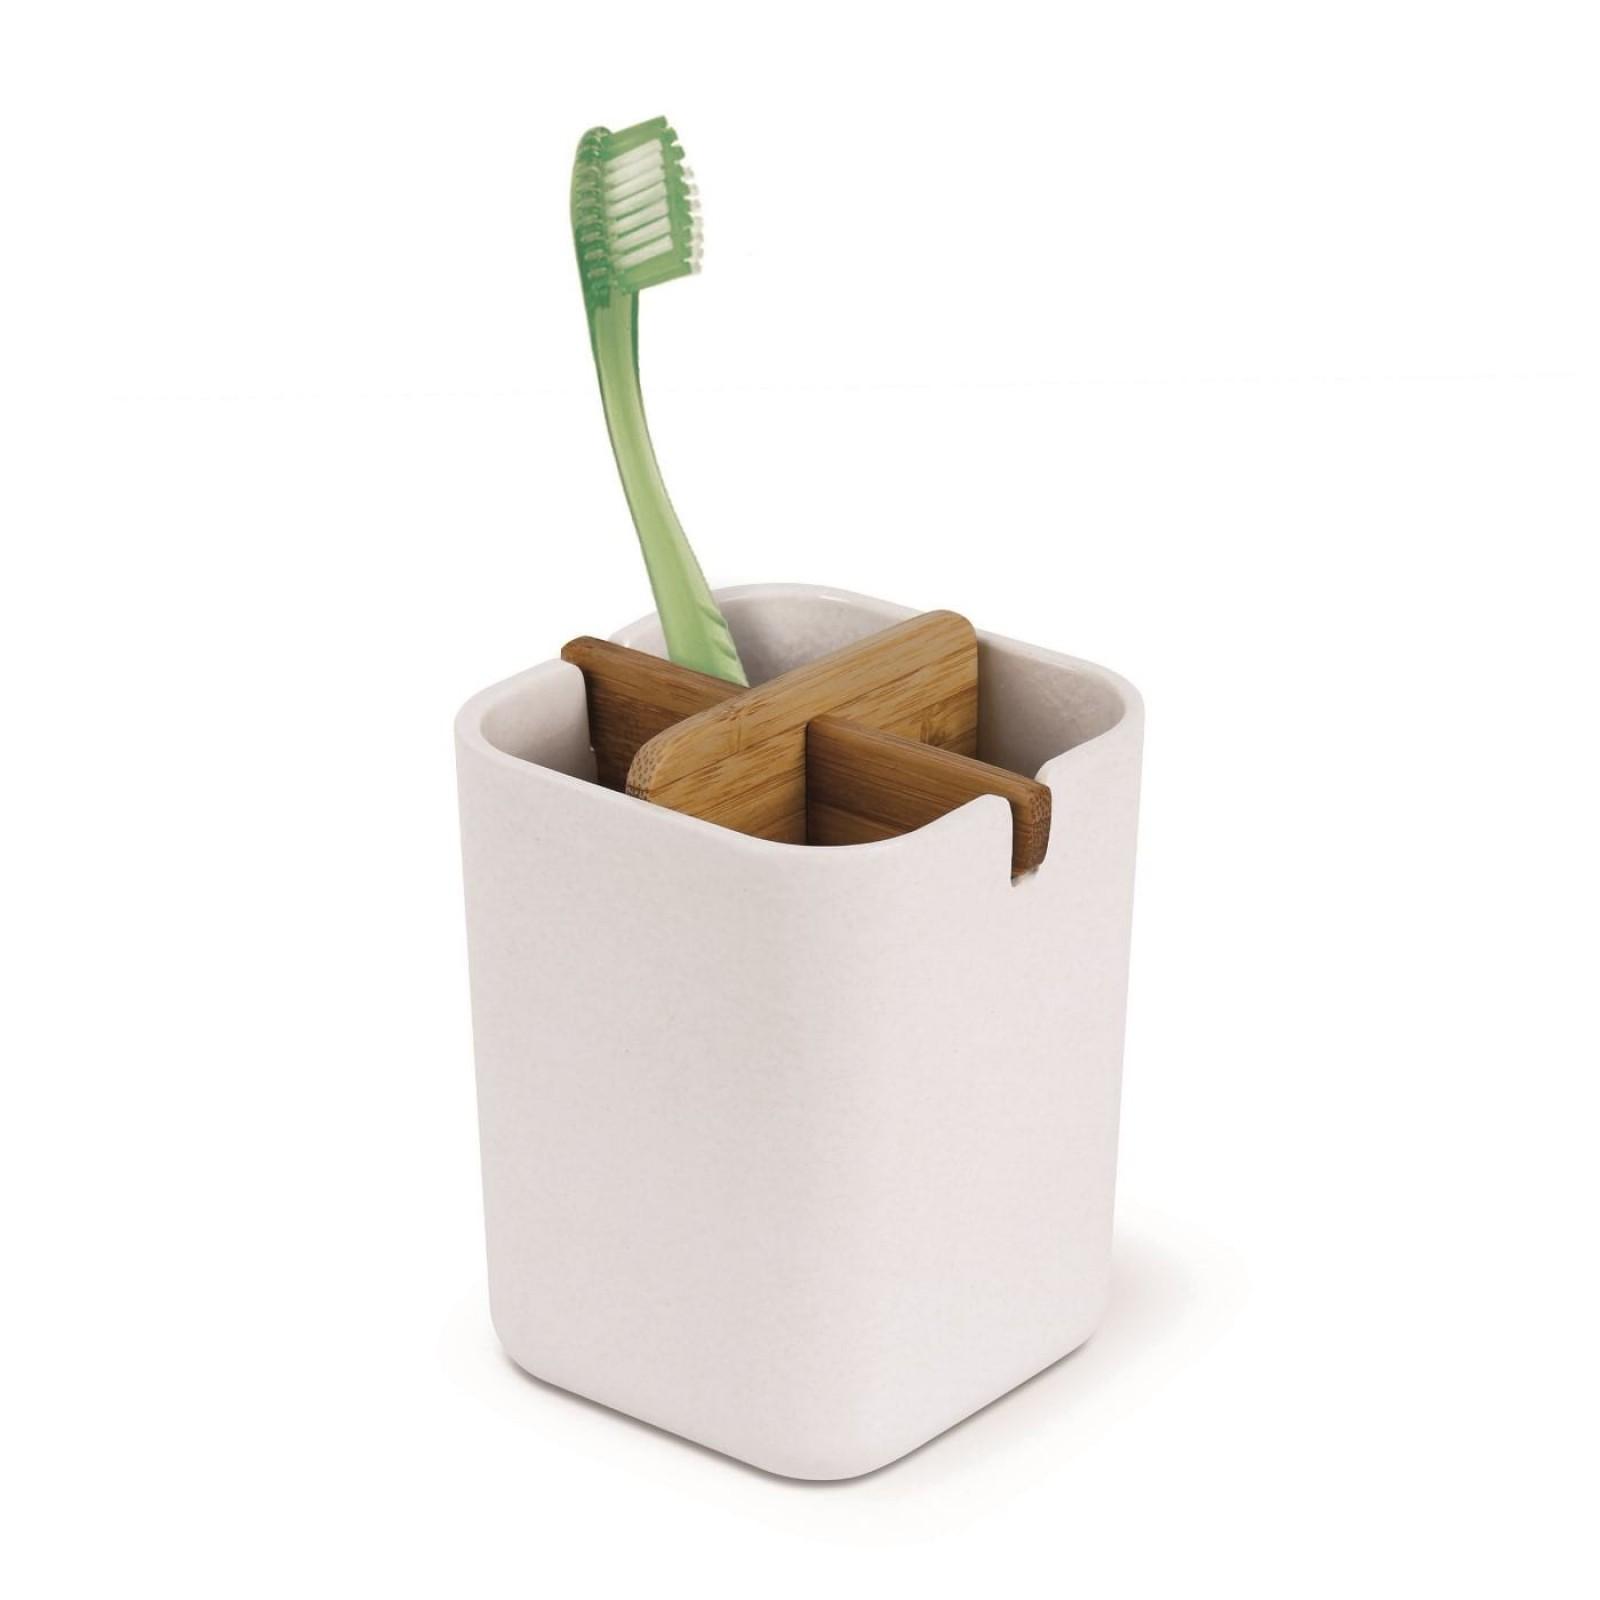 Zen Toothbrush Cup - LEXON